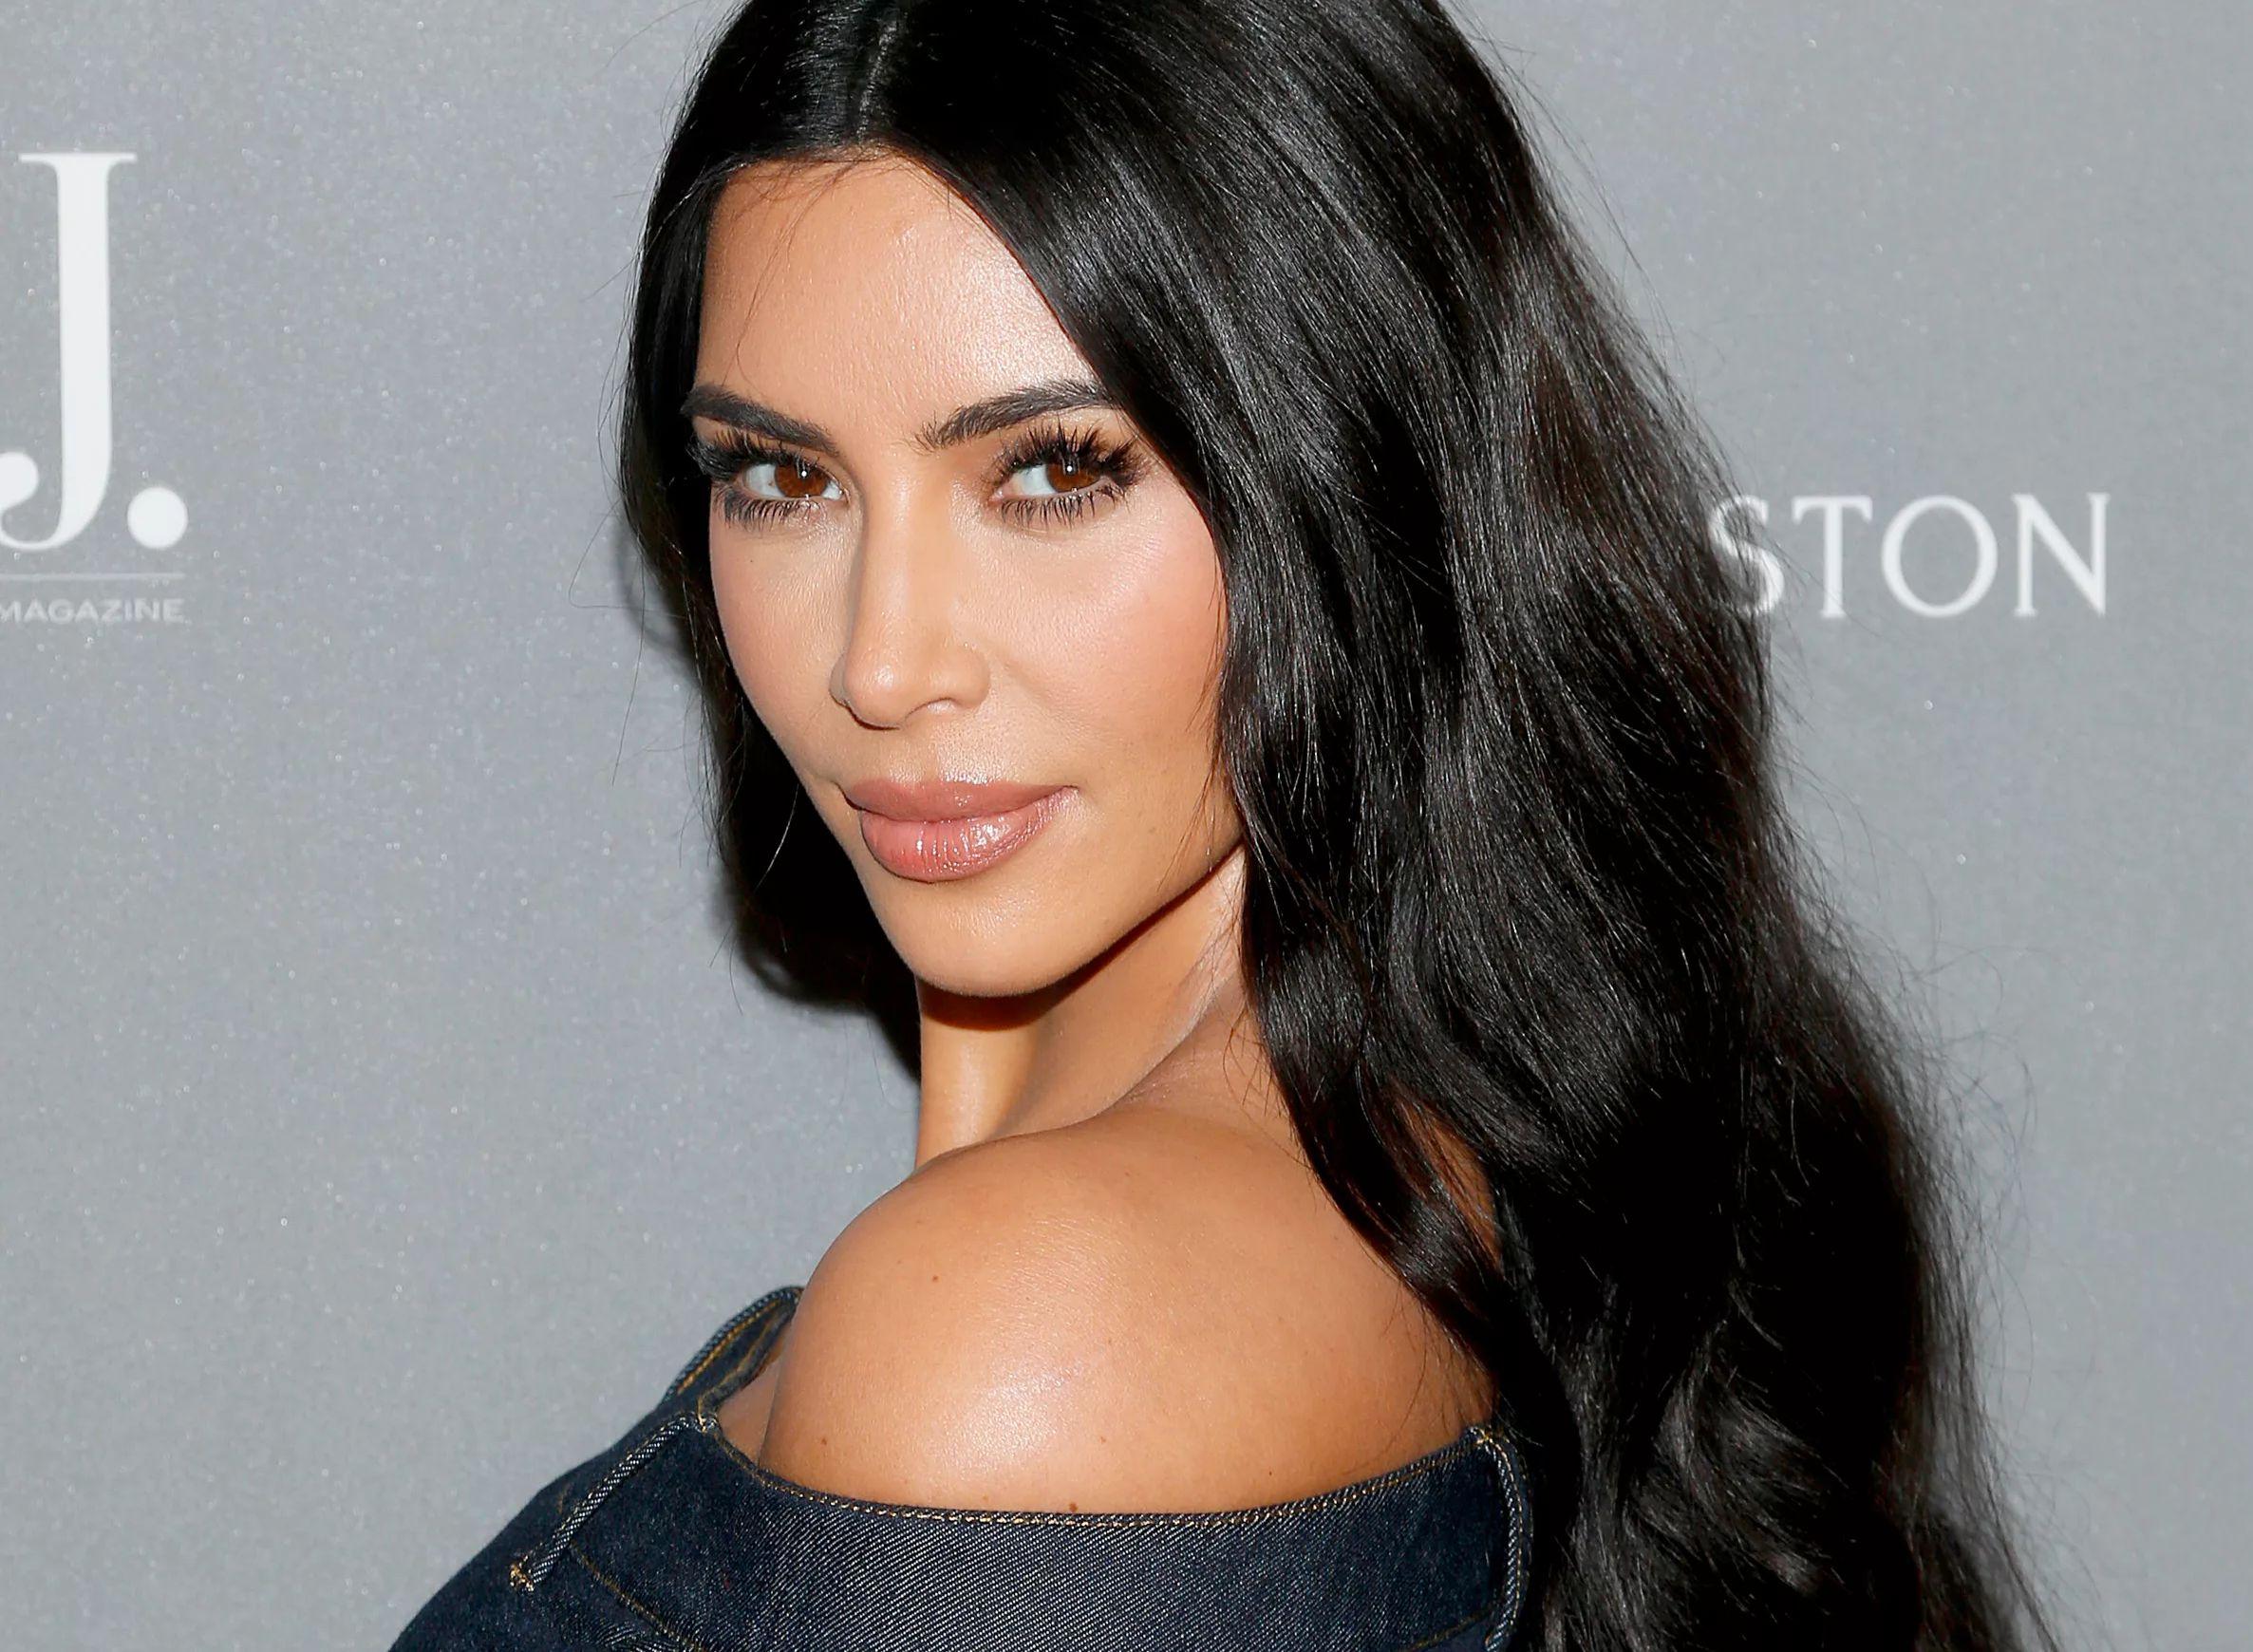 Kim Kardashian with hair down